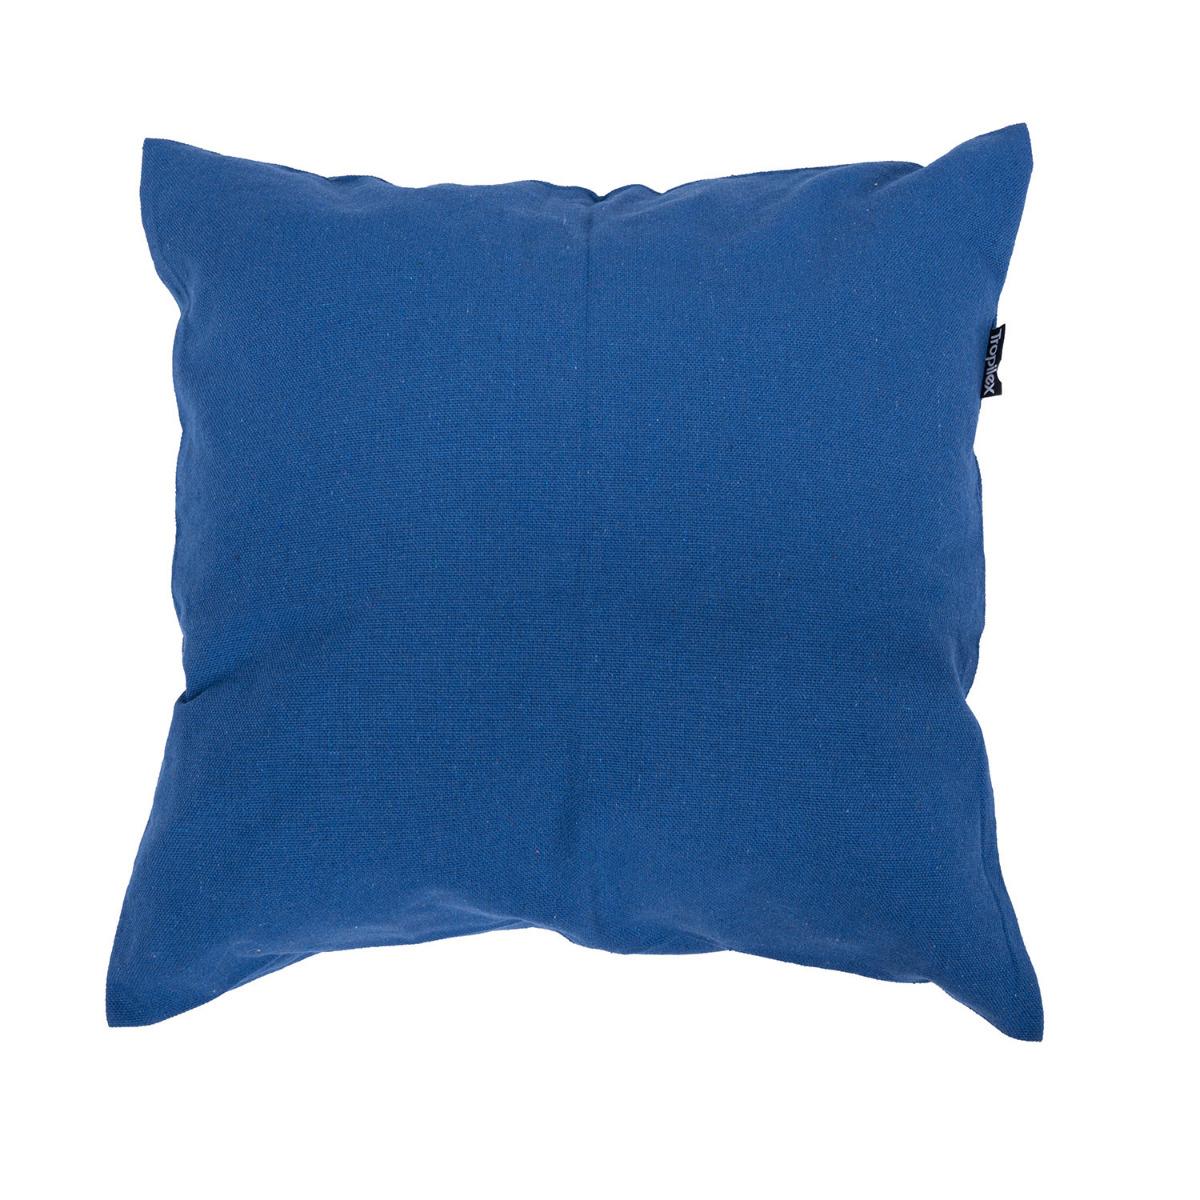 'Plain' Blue Kussentje - Blauw - Tropilex ®